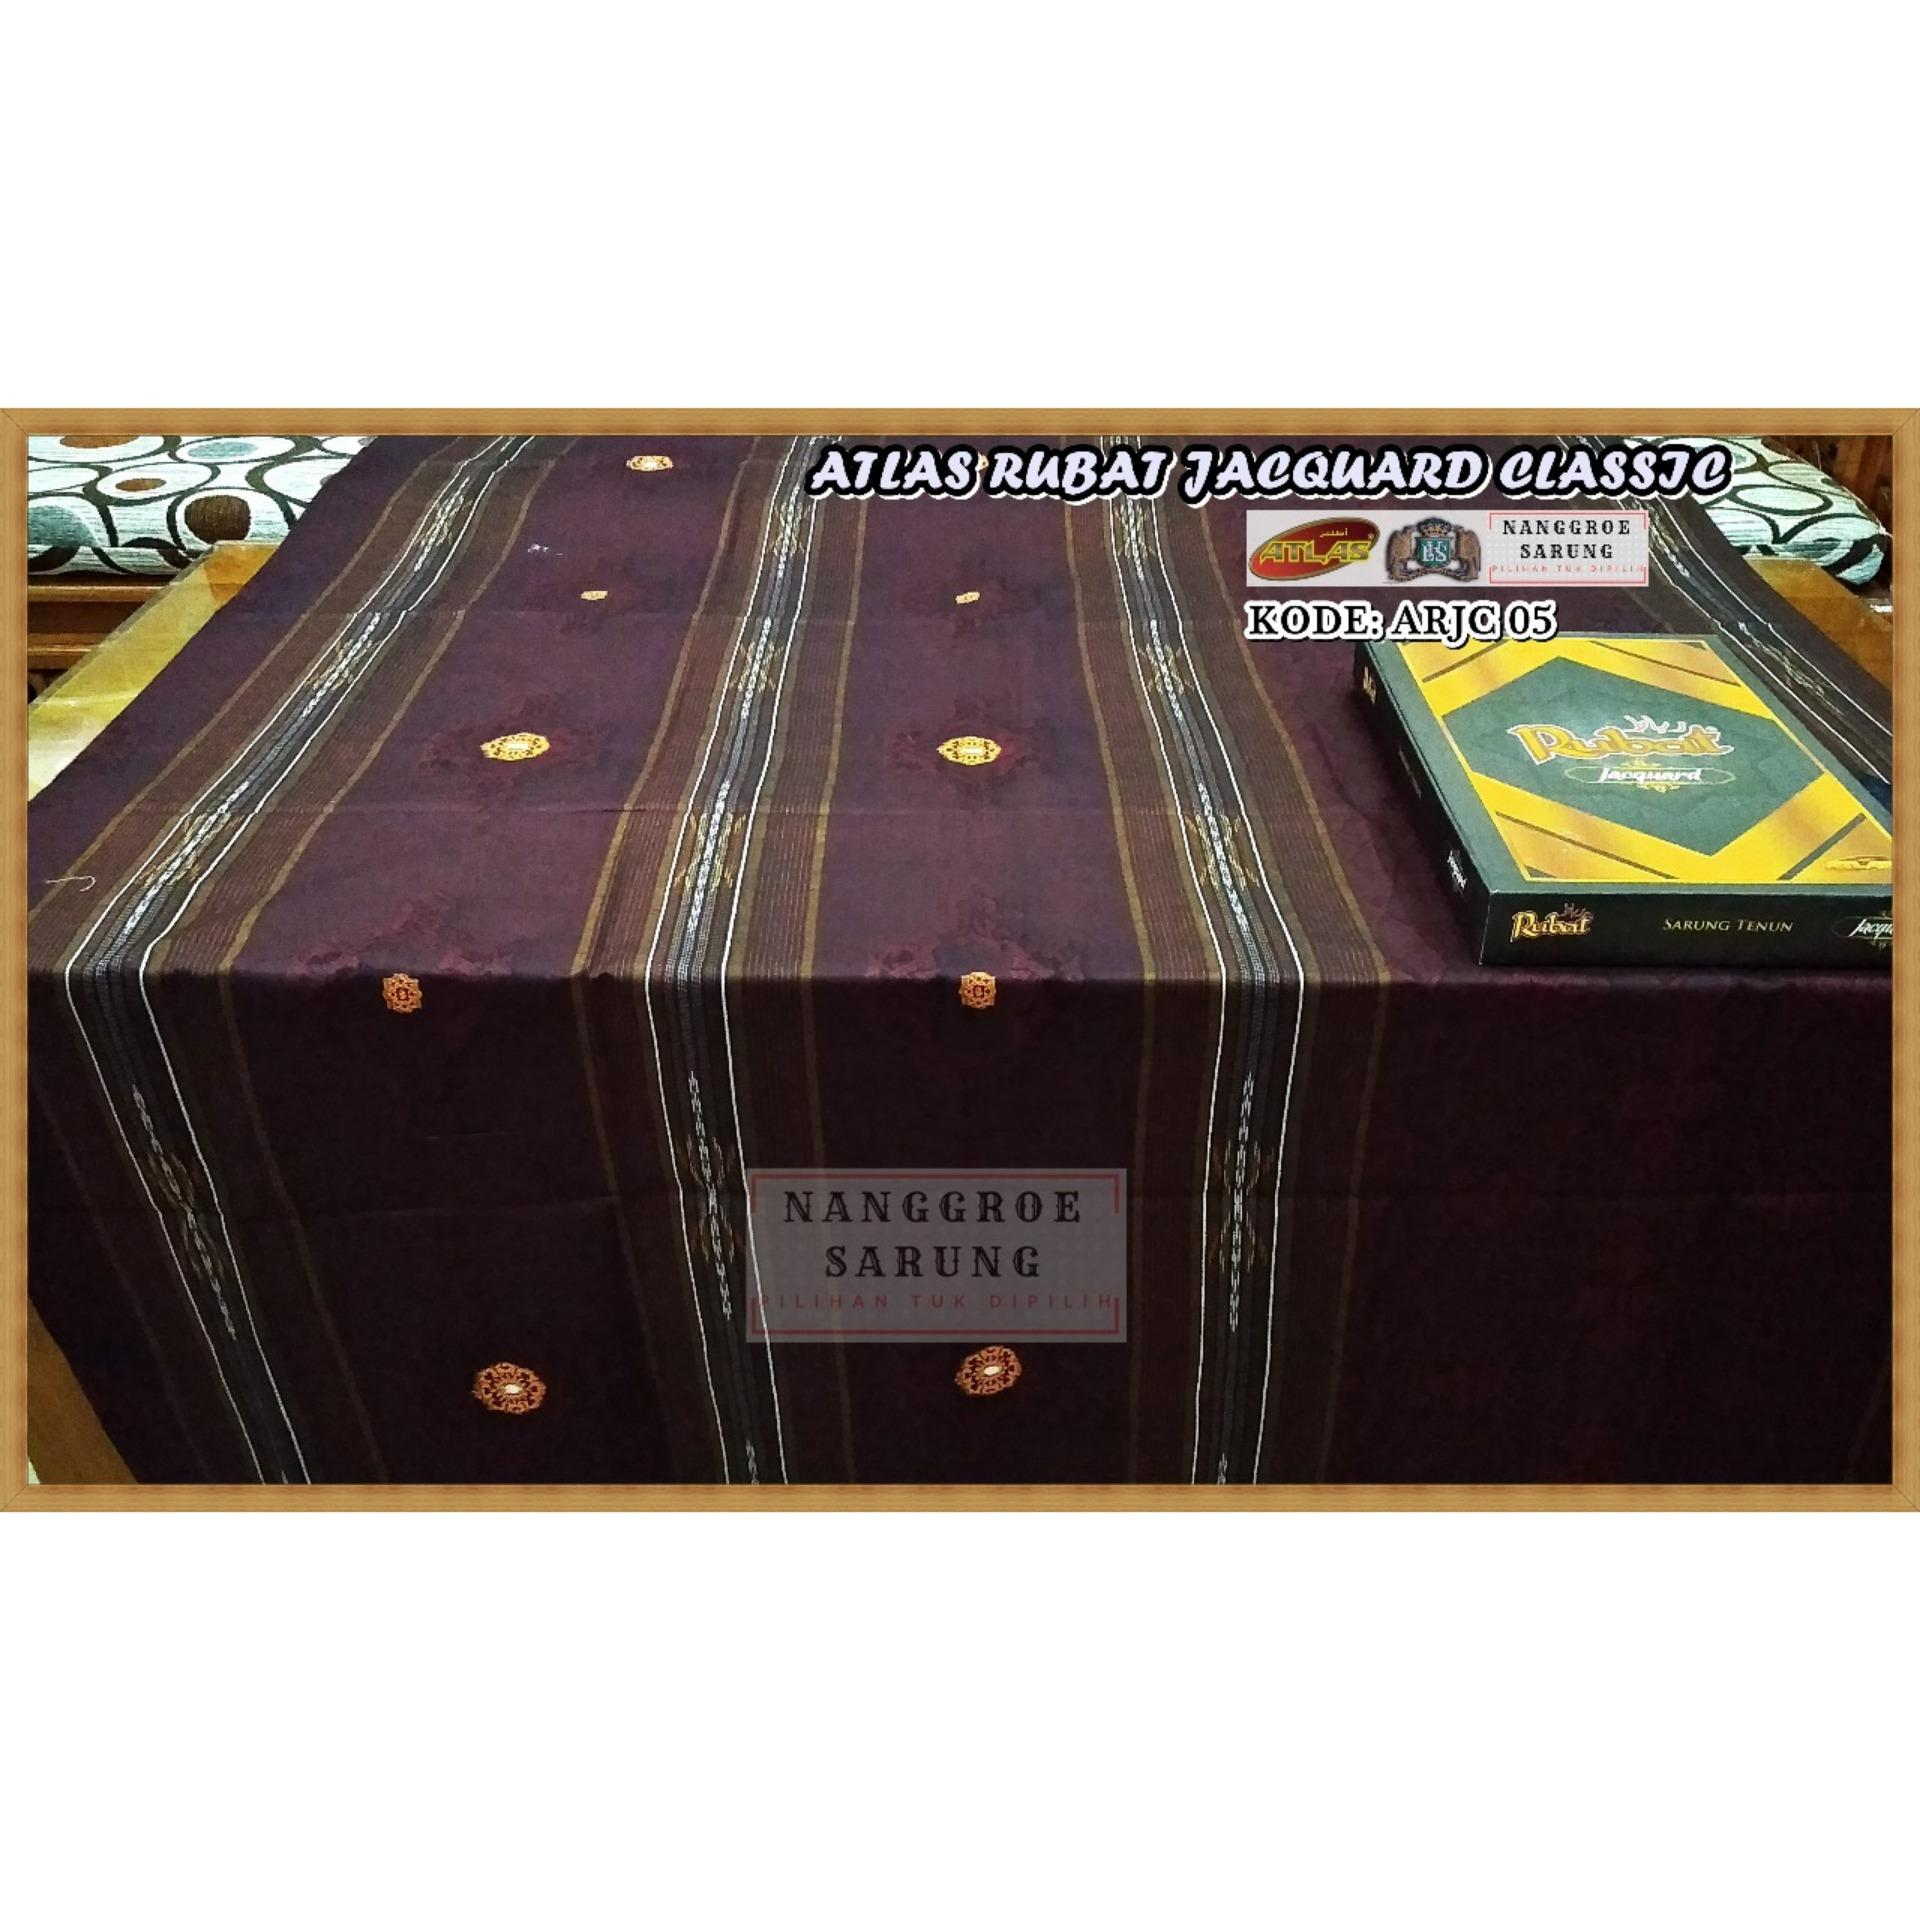 Sarung Atlas Rubat Motif Jacquard Classic 5